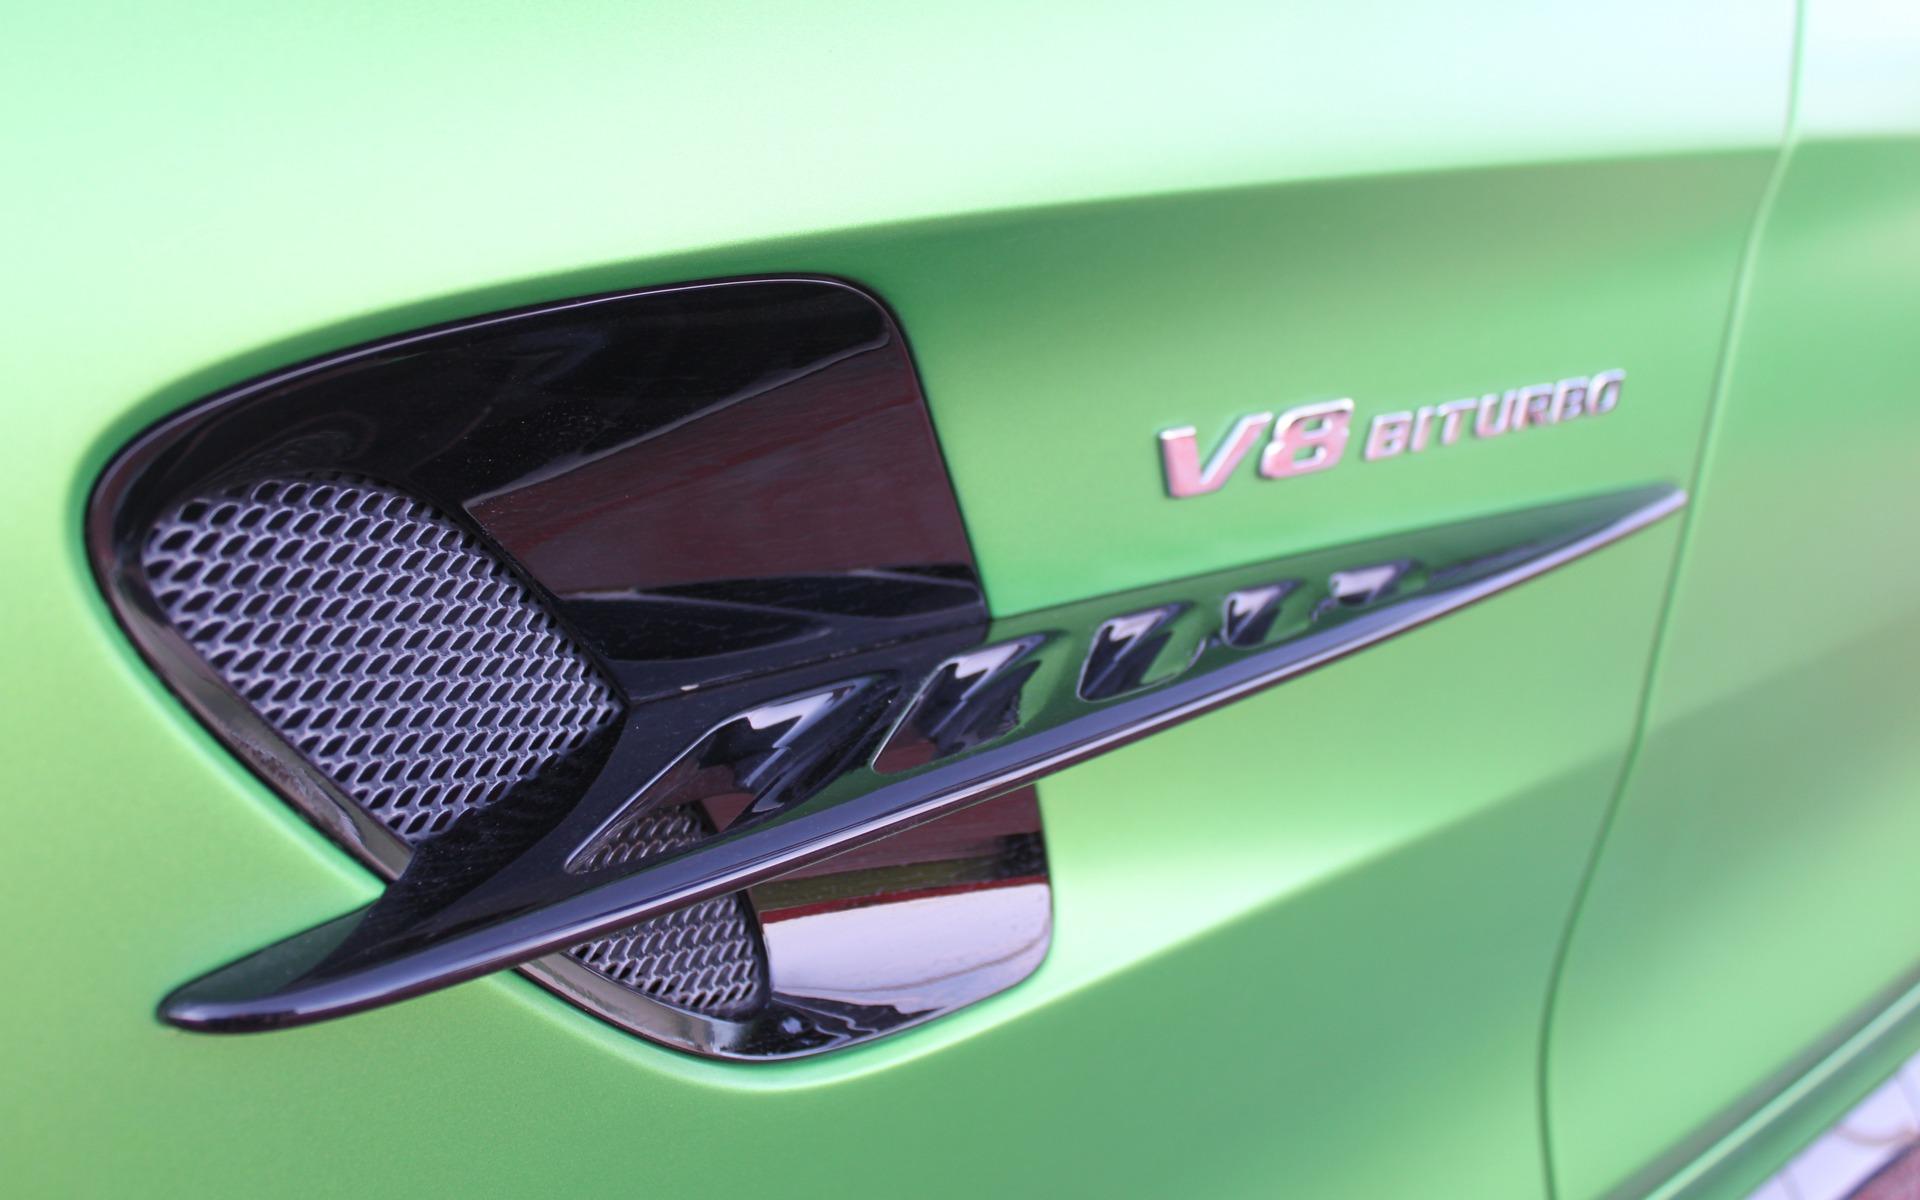 2018 Mercedes-AMG GT R: Green Car of the Year? - 3/50